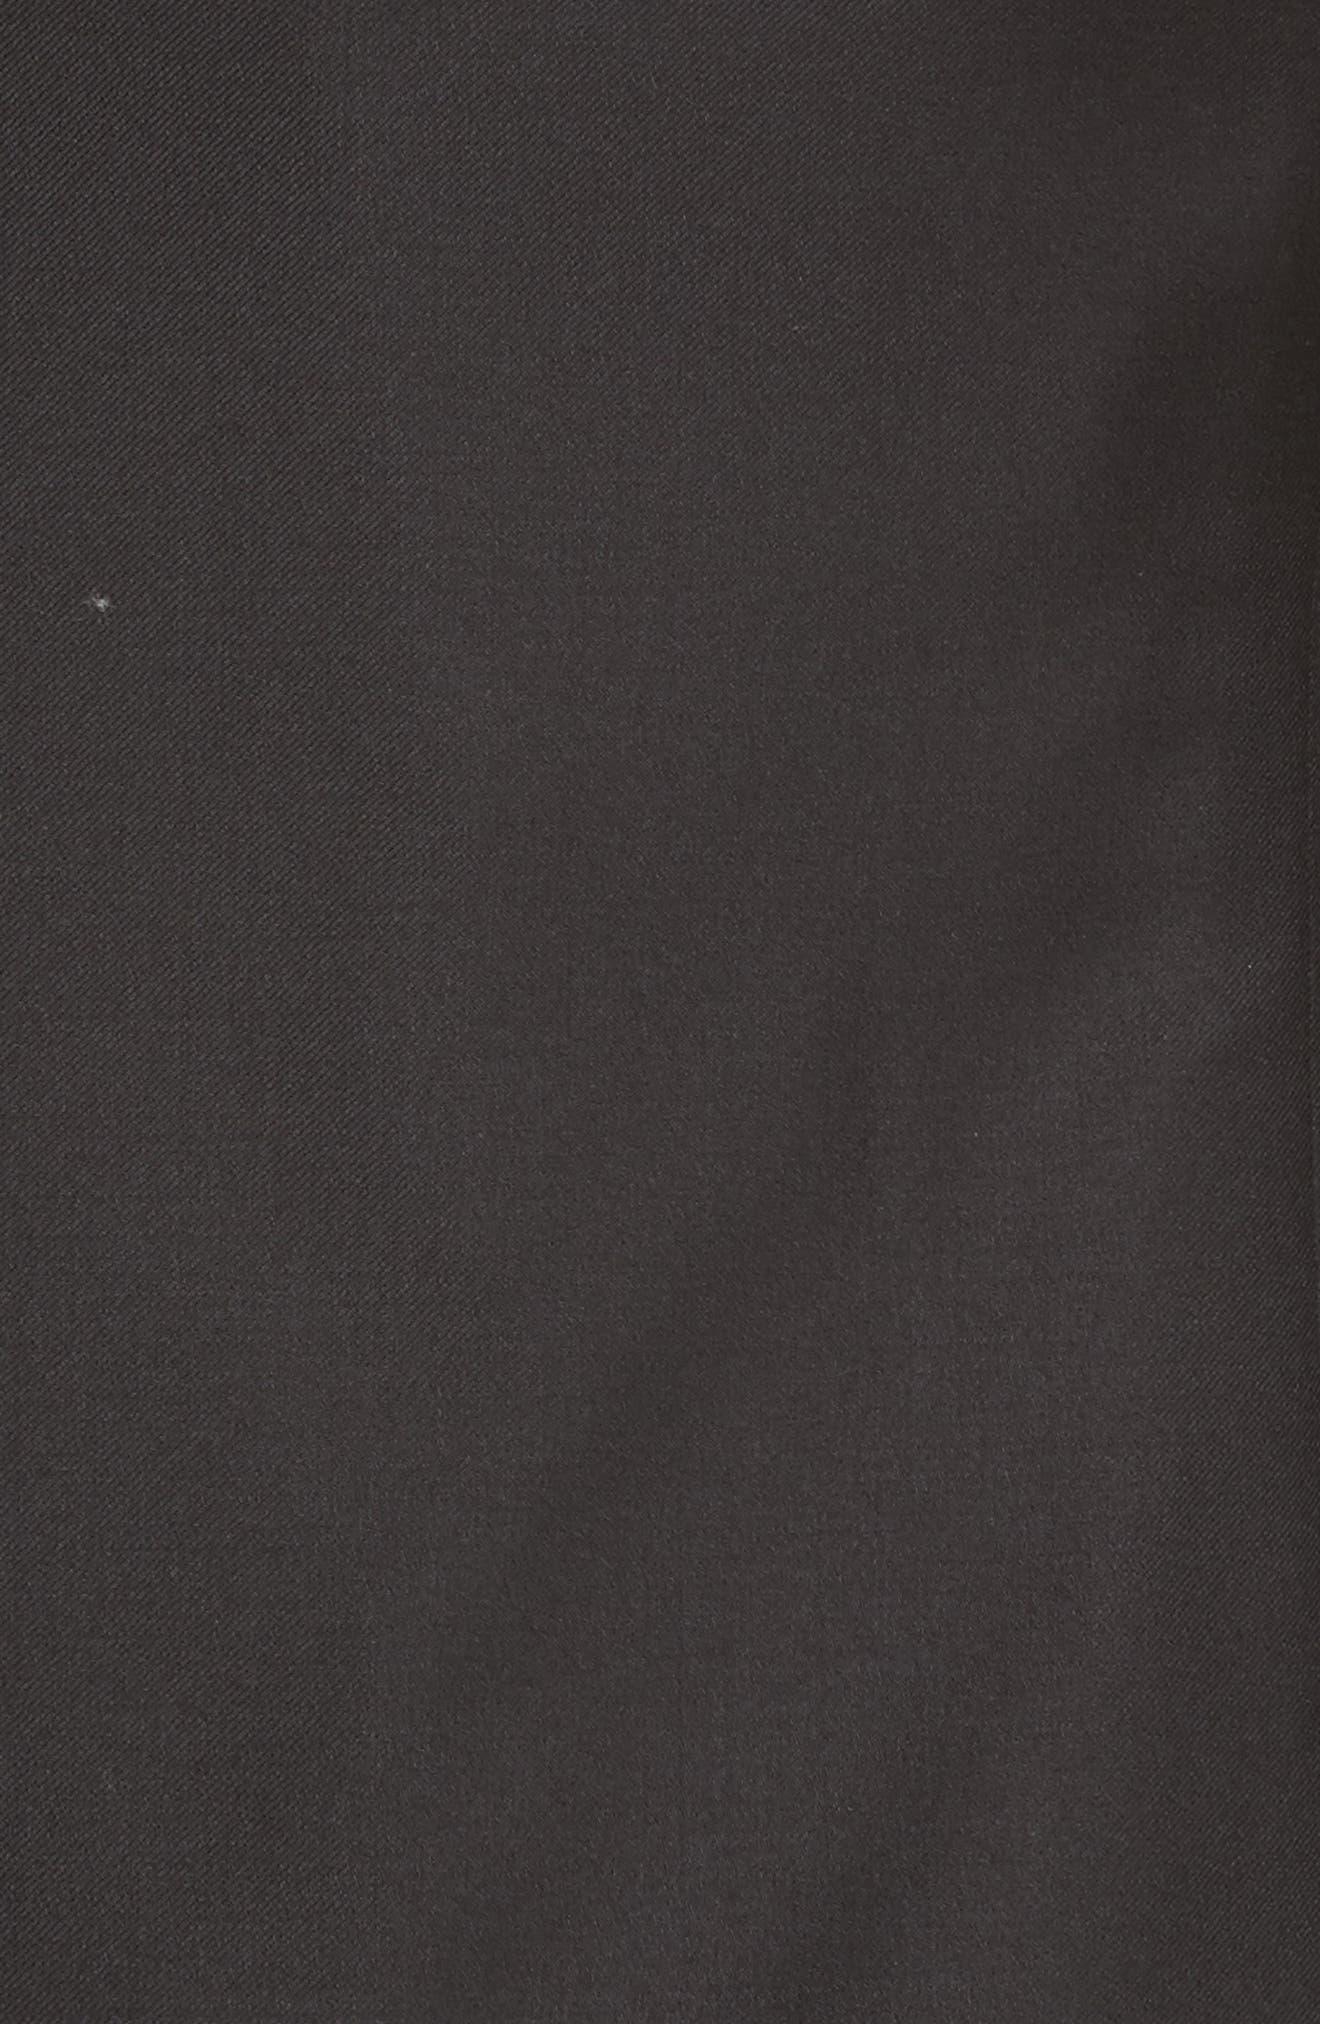 EMPORIO ARMANI, Trim Fit Wool Tuxedo, Alternate thumbnail 7, color, BLACK